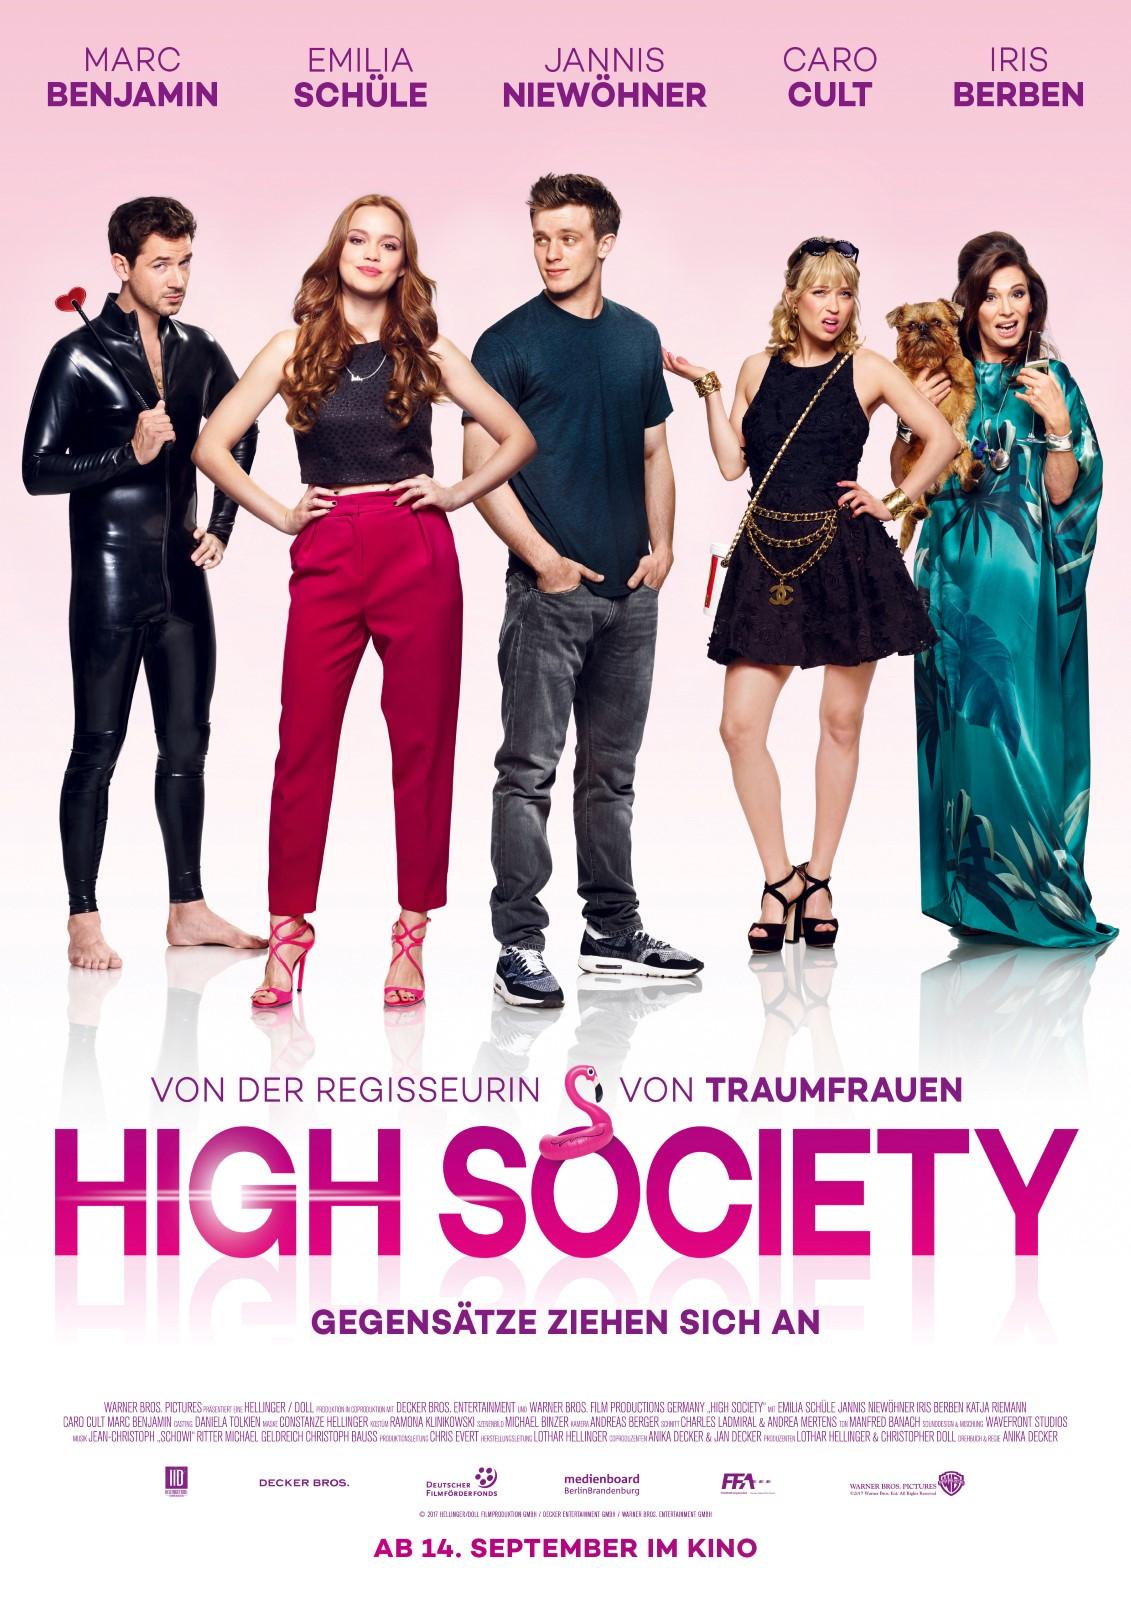 High Society - Gegensätze ziehen sich an - Film 2017